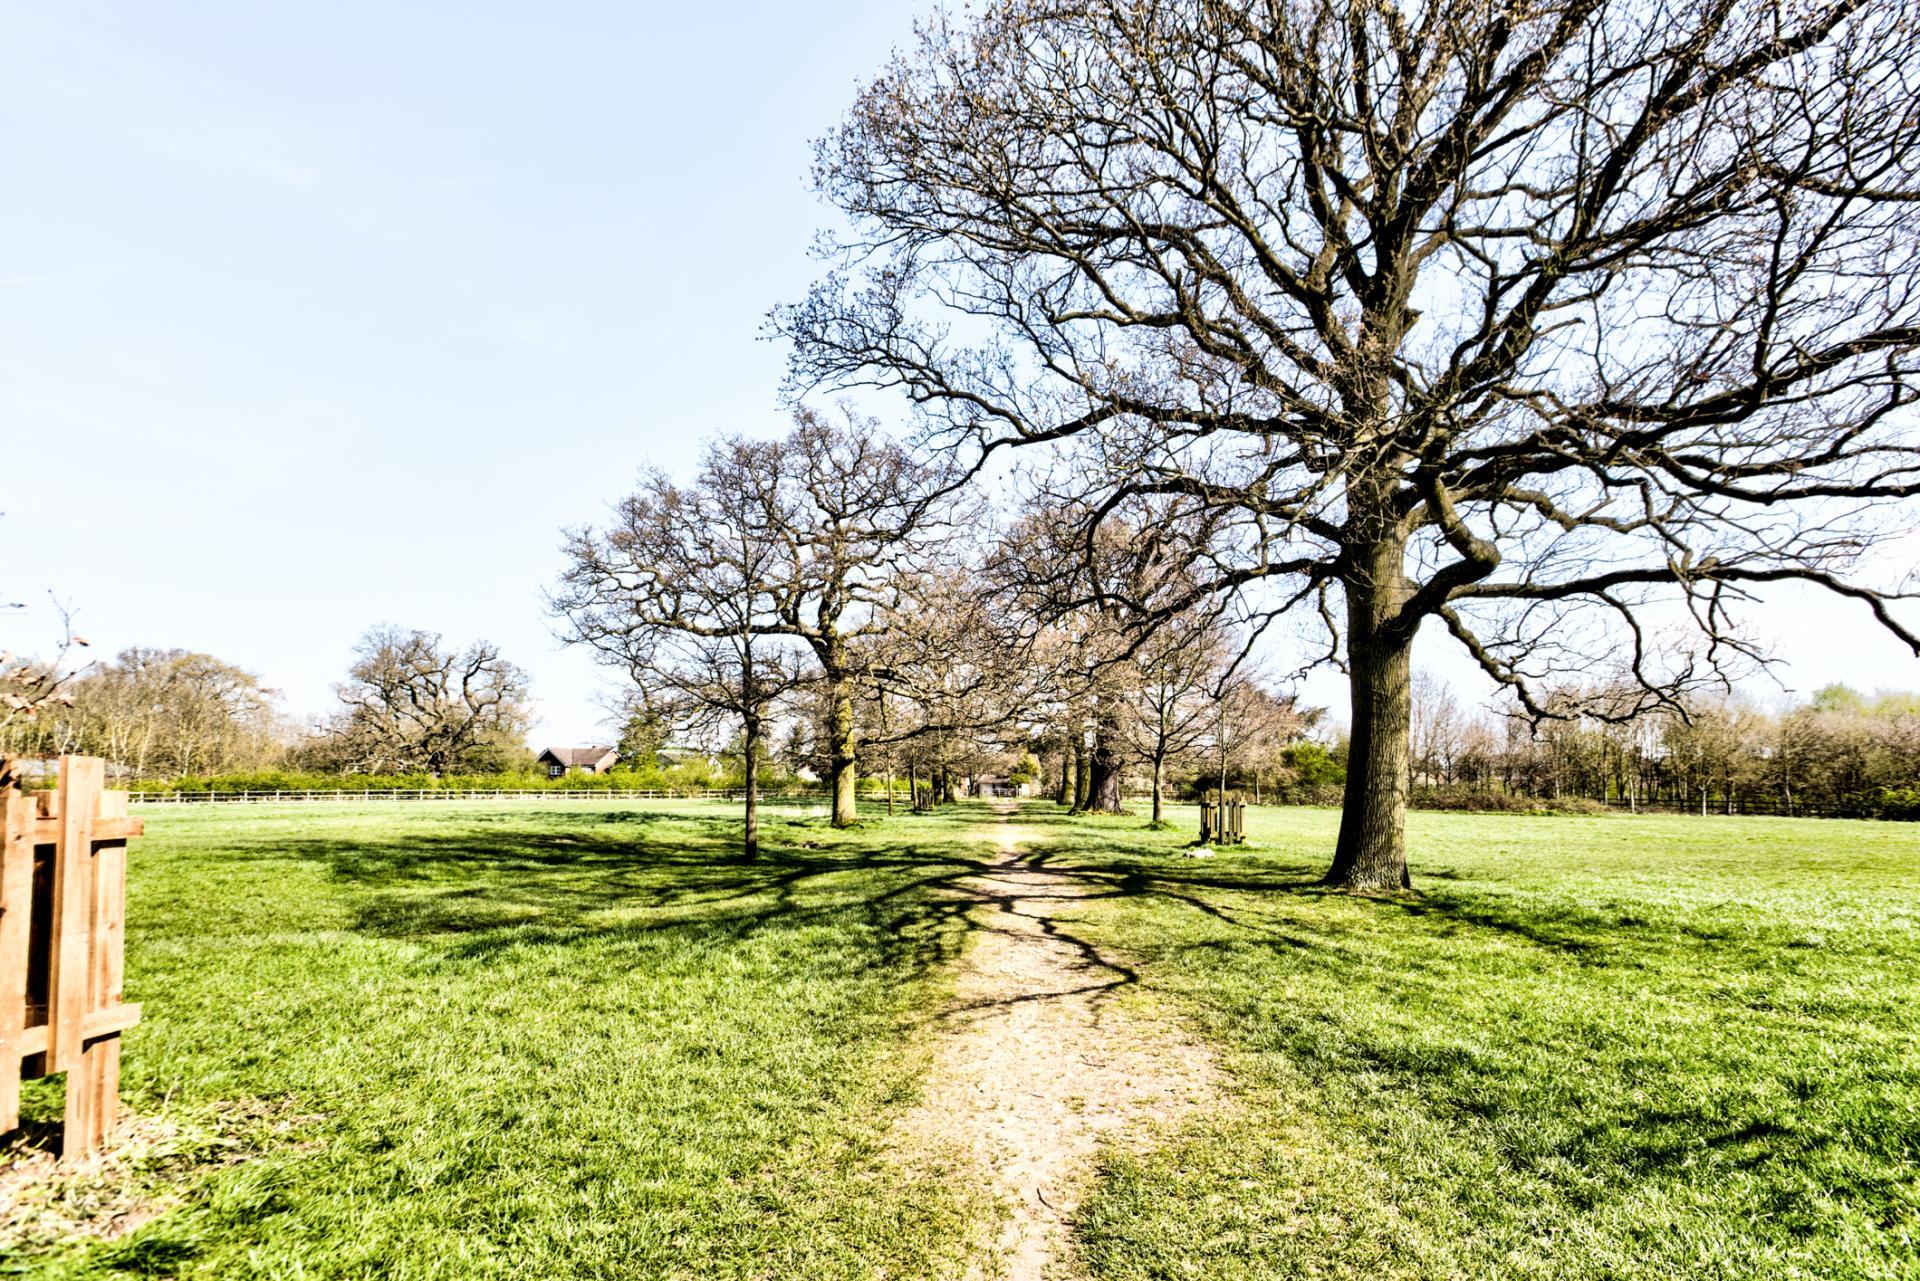 pishiobury_park-2_hd